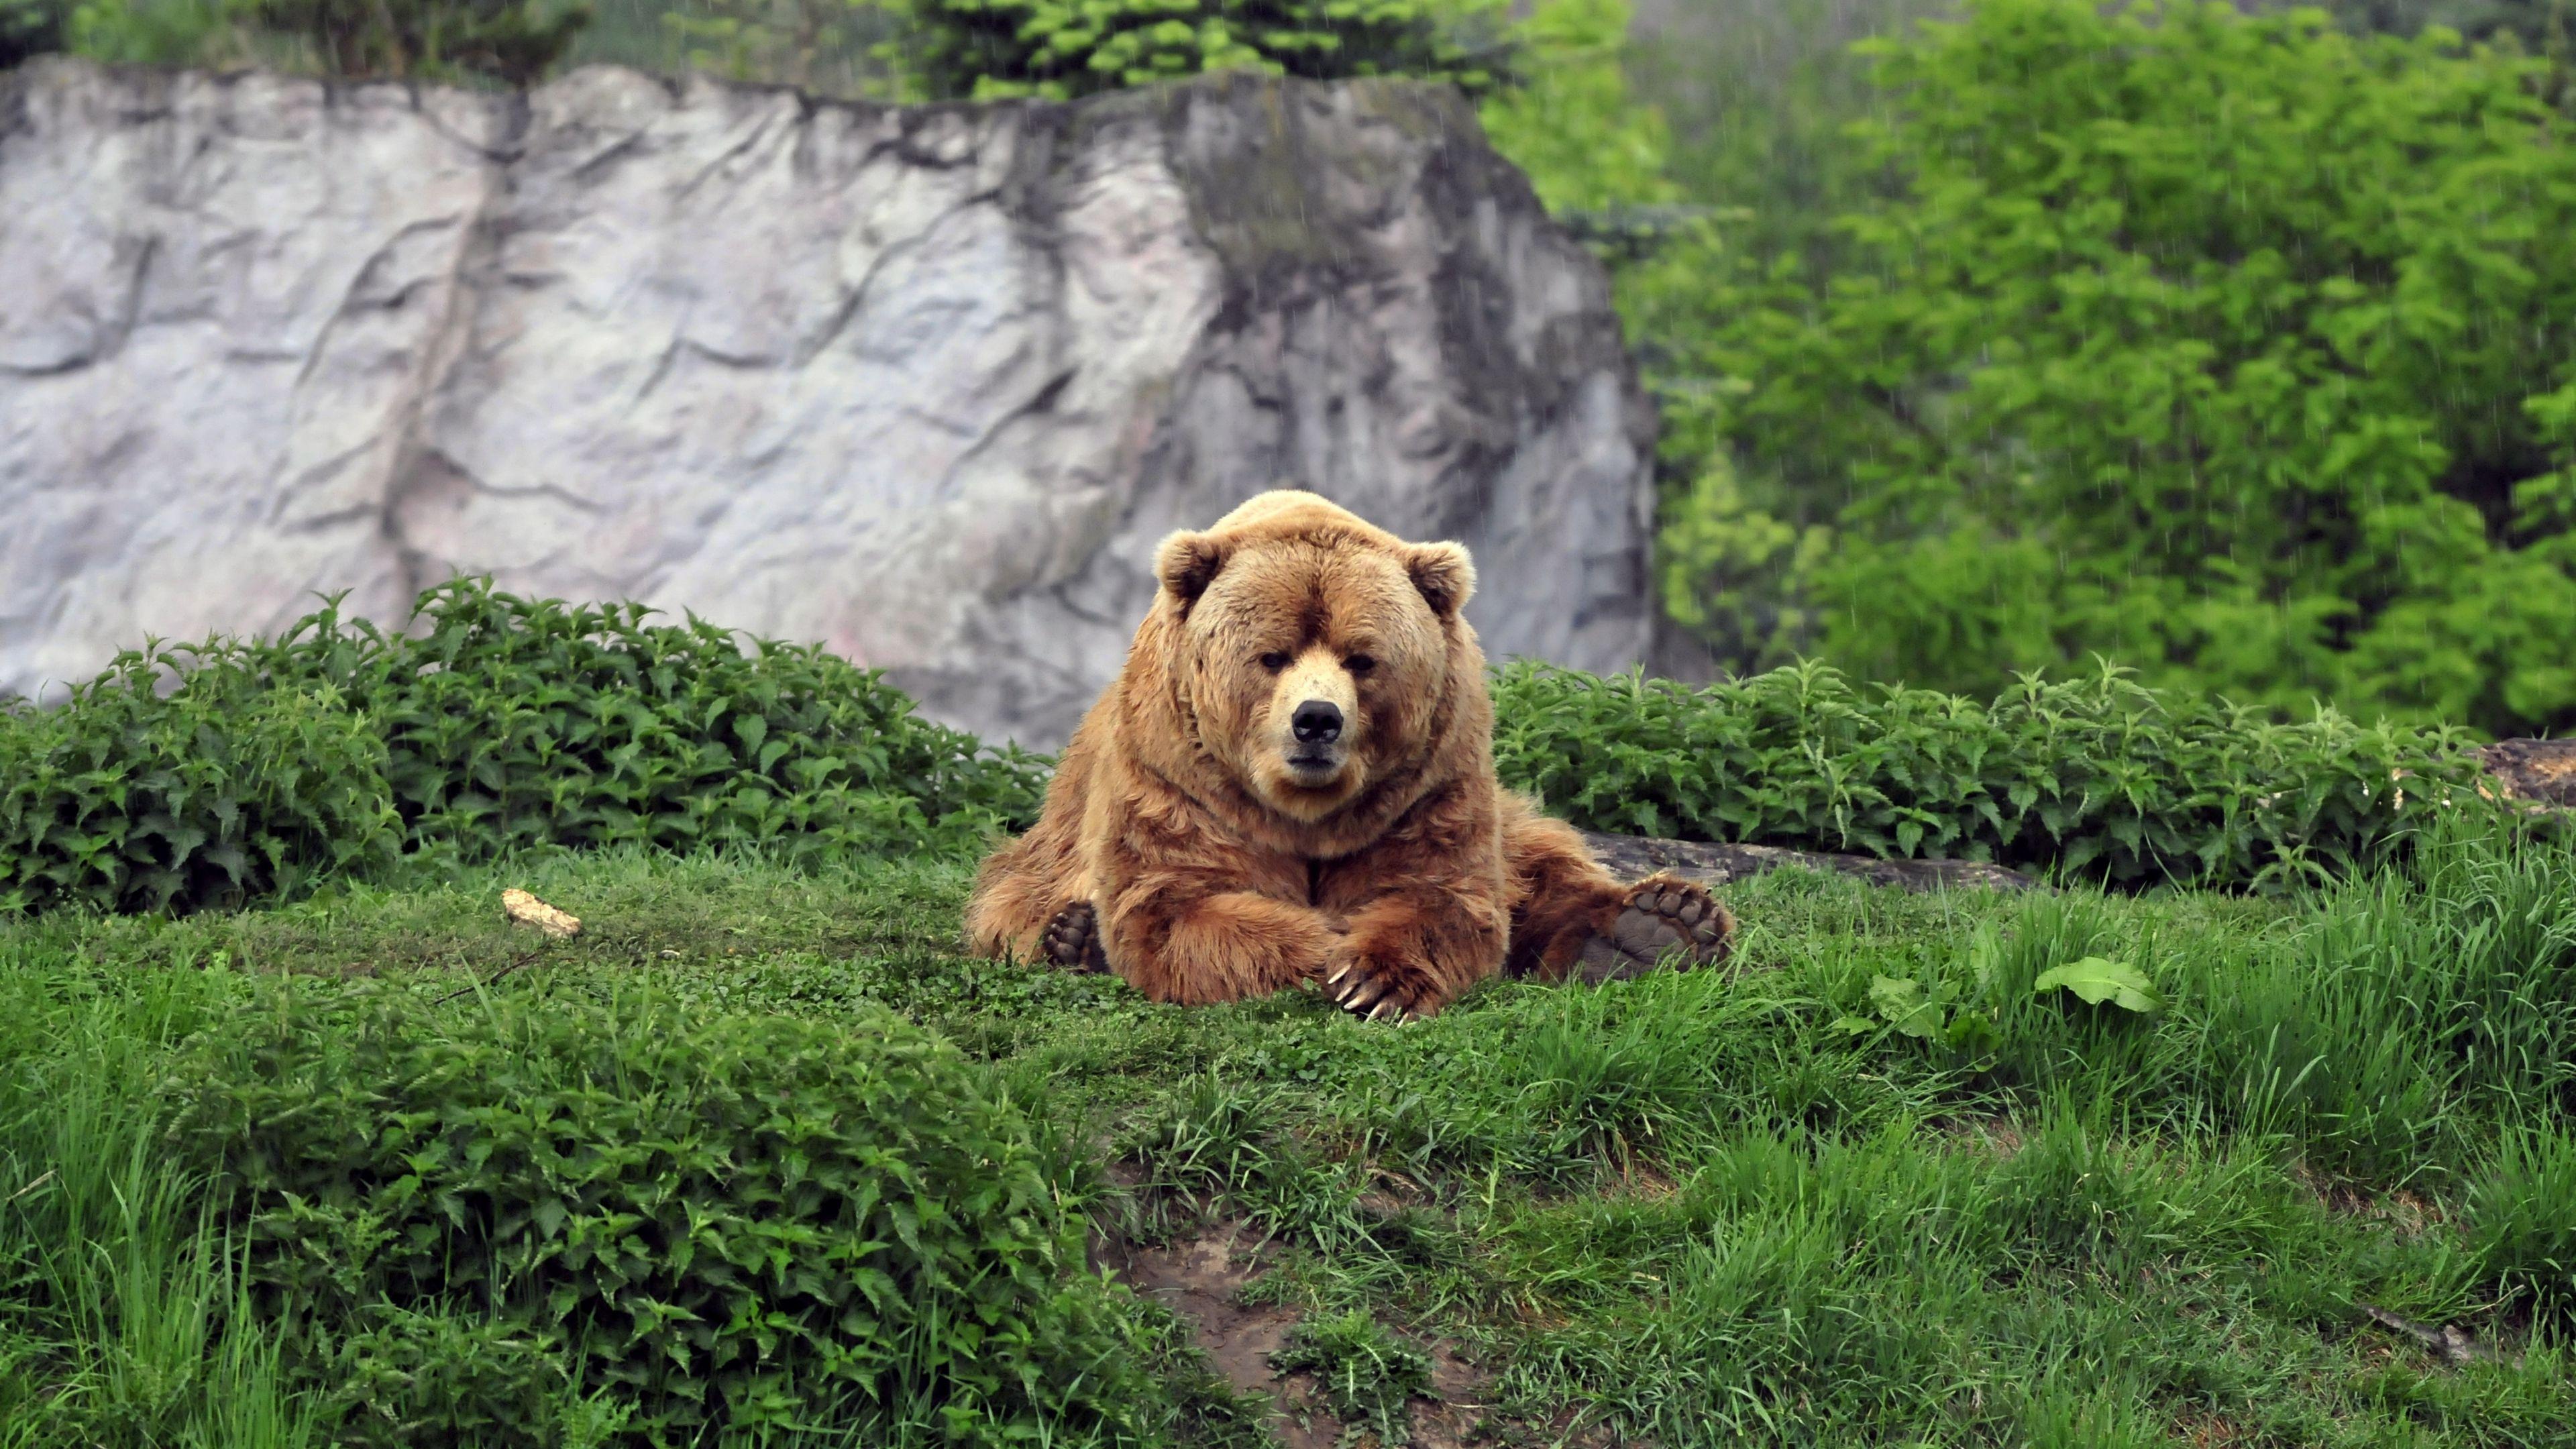 3840x2160 wallpaper bear brown grass funny lie animal